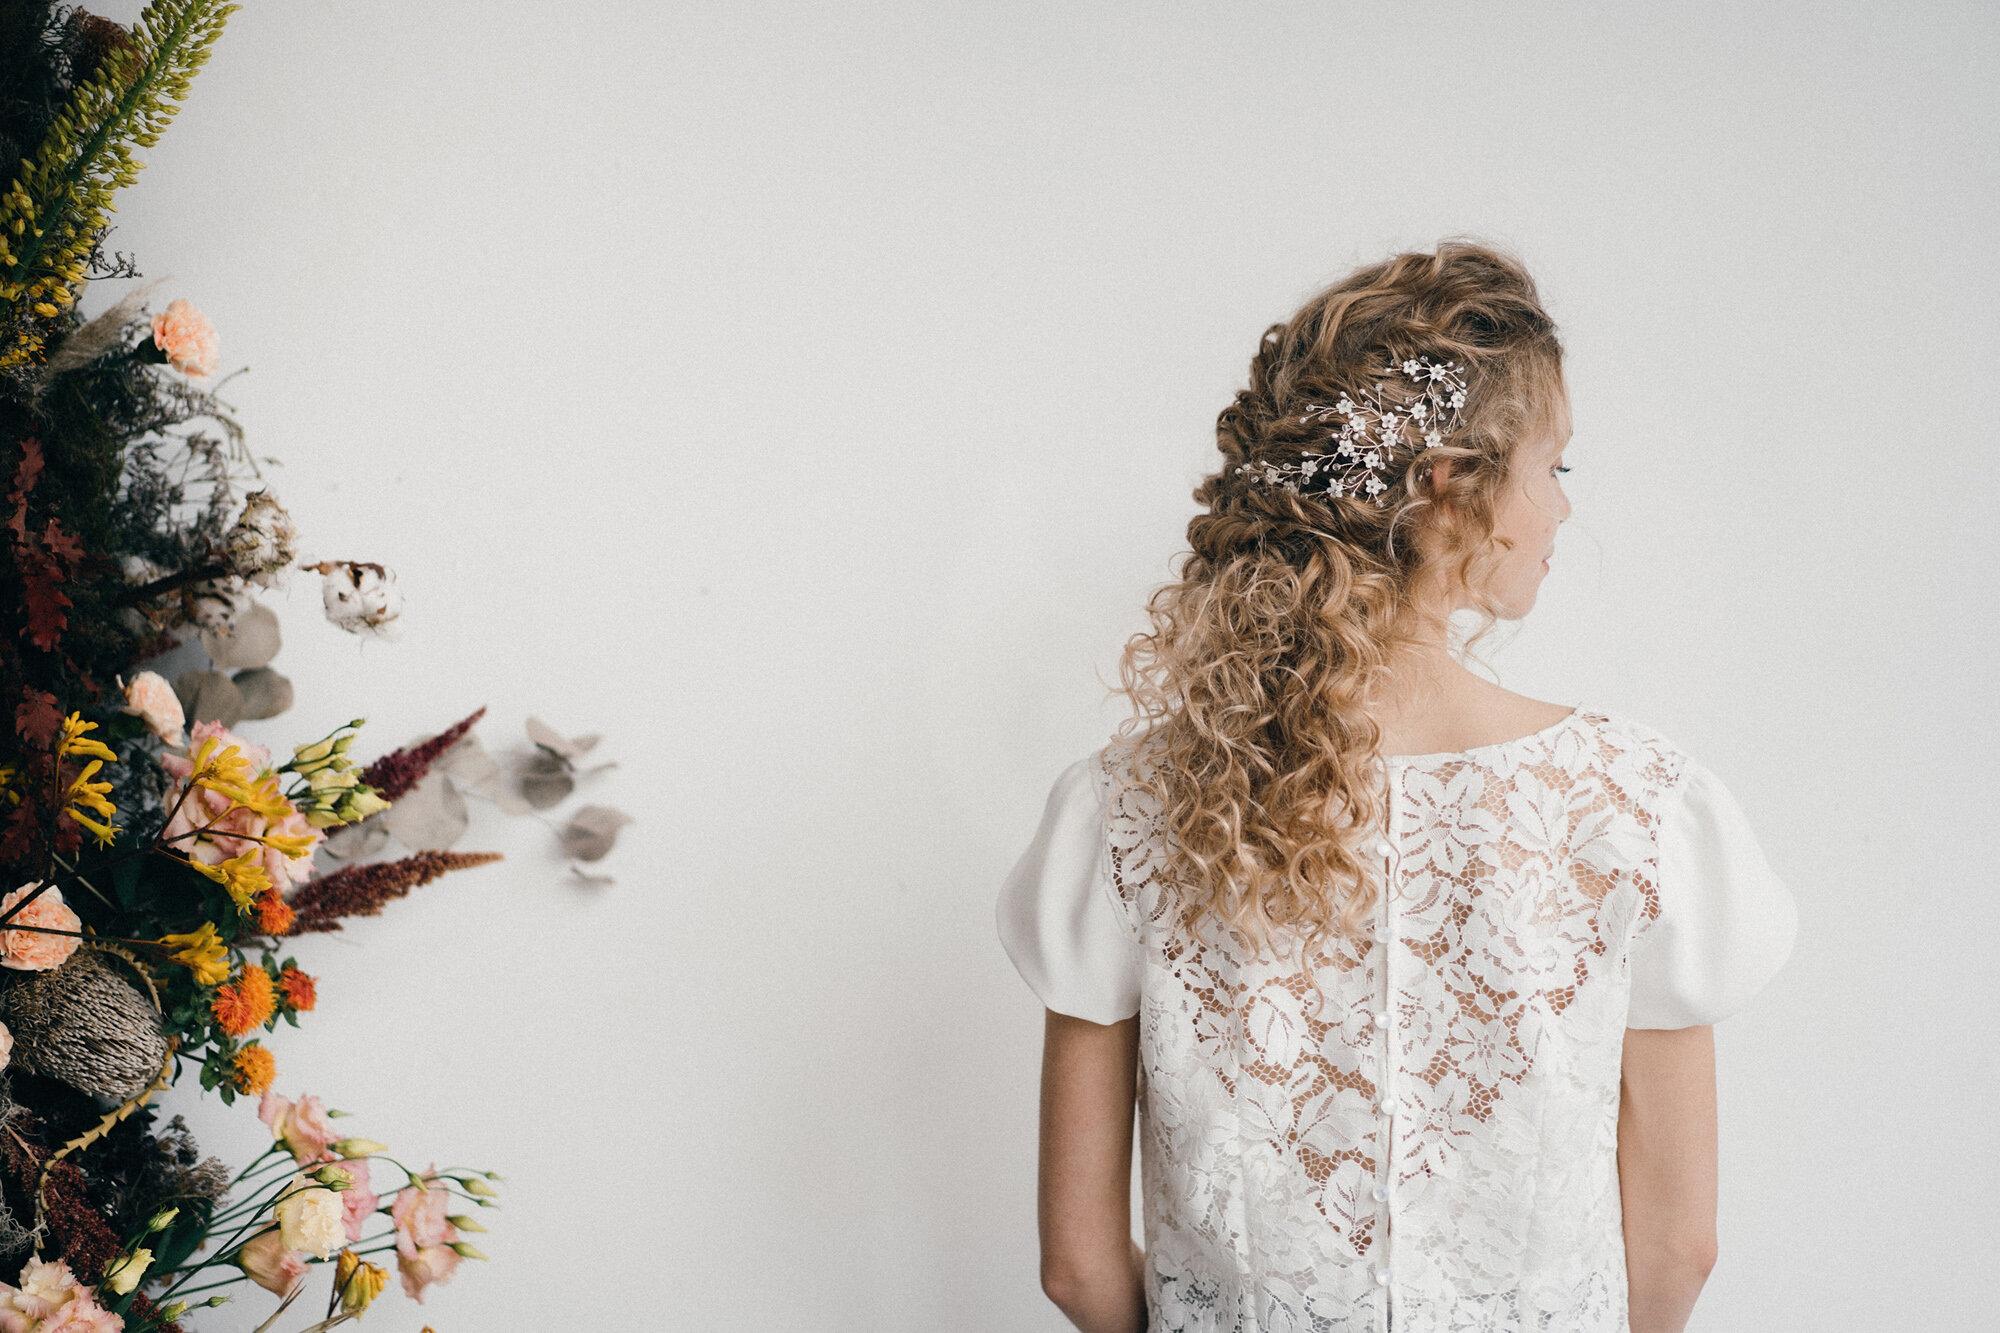 Debbie-Carlisle-Bridal-Accessories-Kate-Beaumont-Wedding-Gowns-Sheffield-Yorkshire-UK-33.jpg